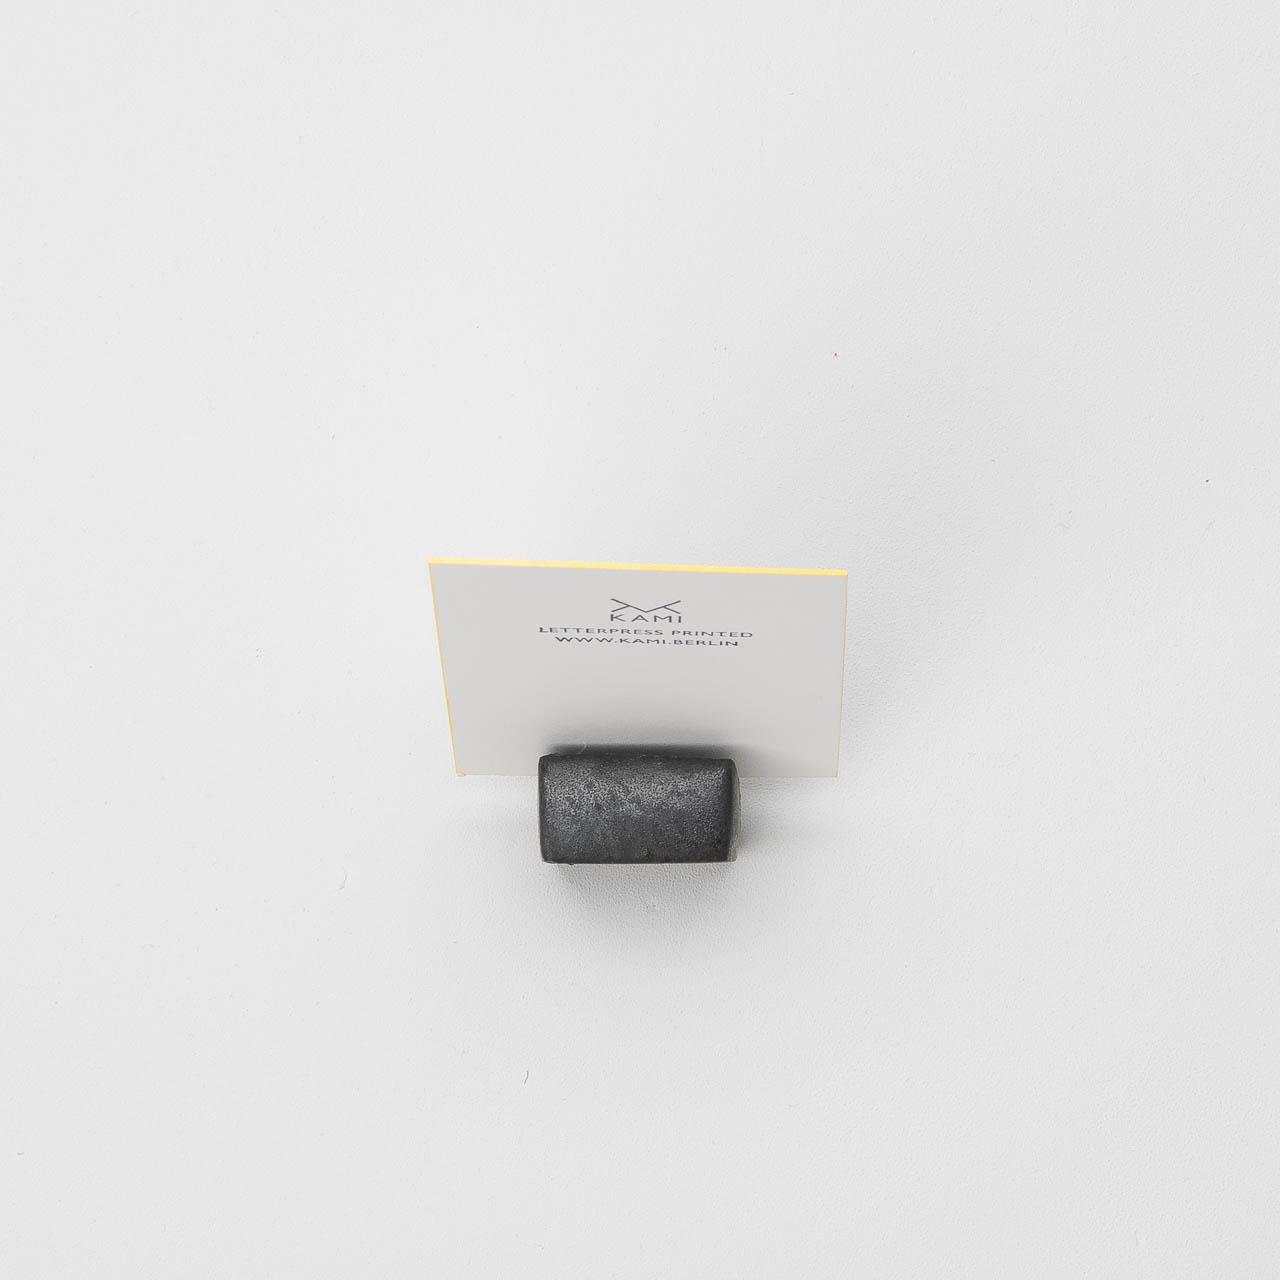 Kami Ceramic Card Holder Black 1 Pc